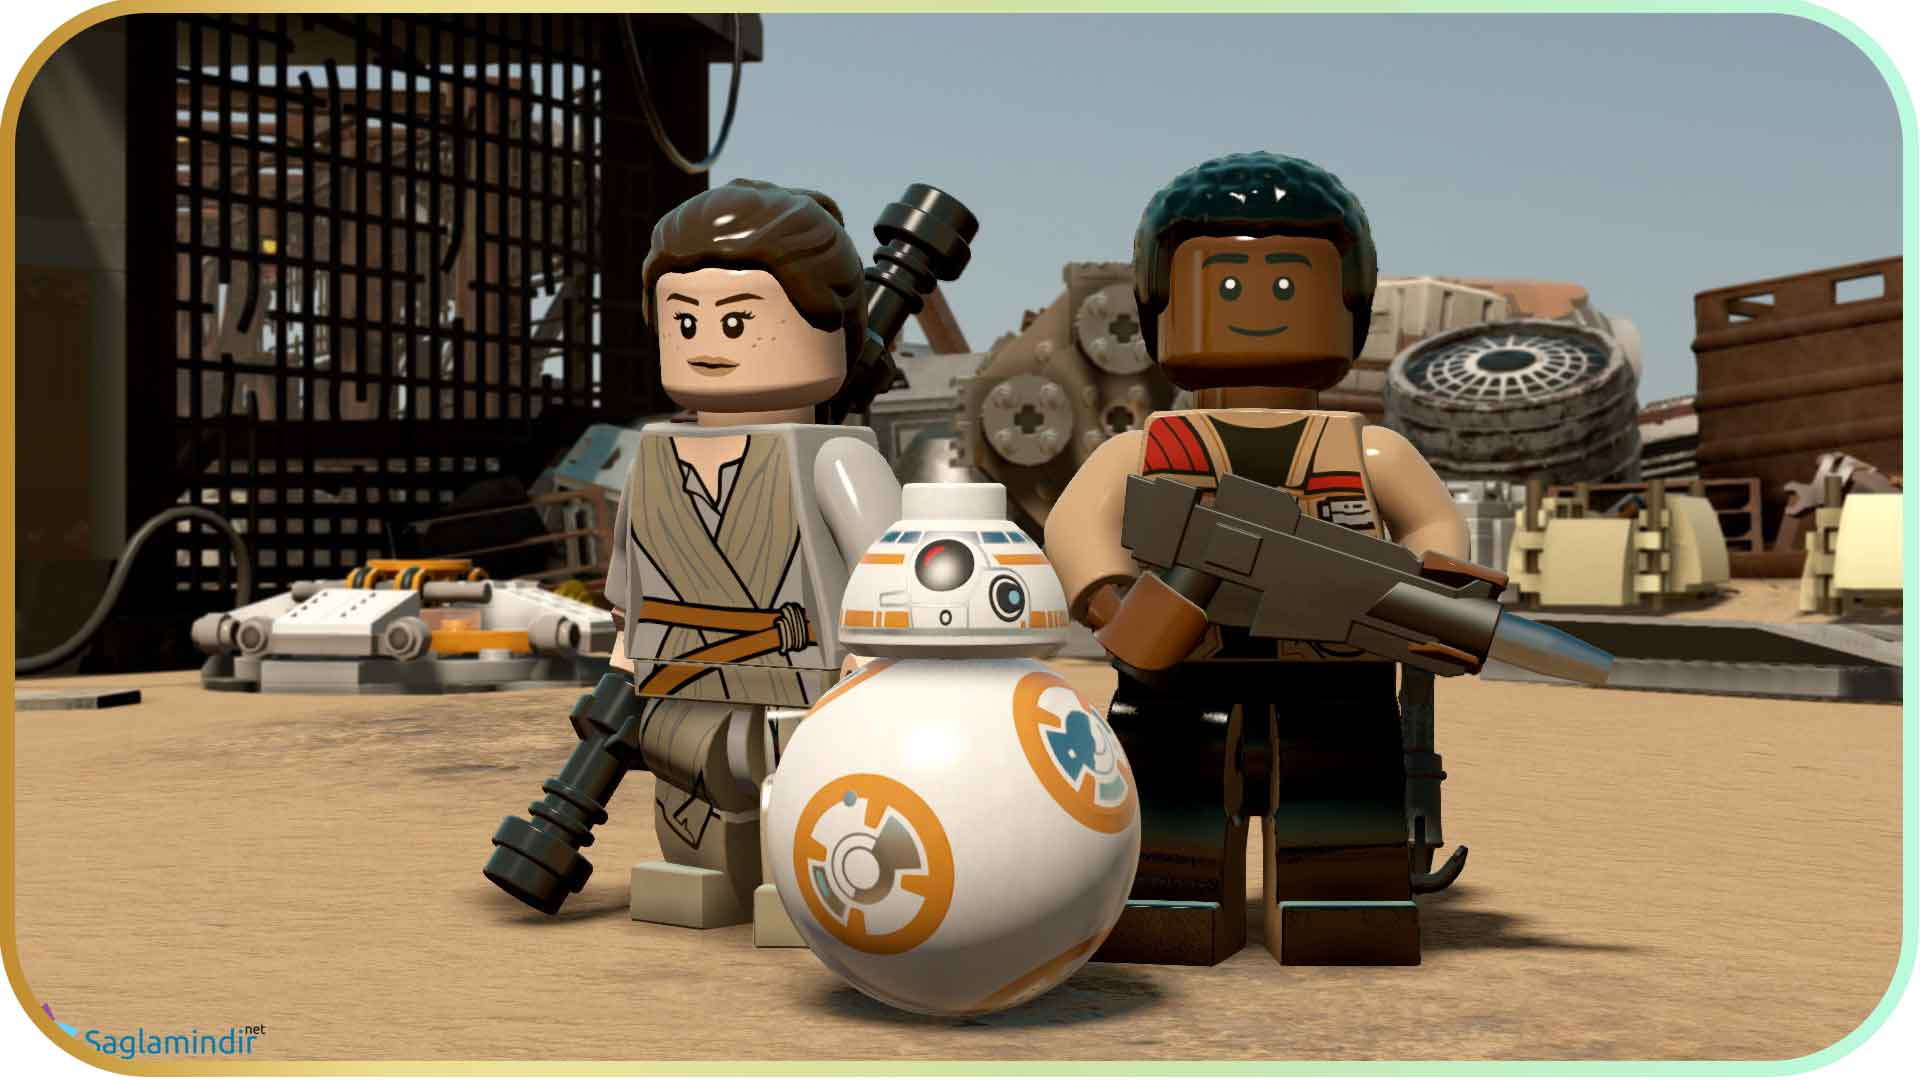 LEGO Star Wars The Force Awakens full indir